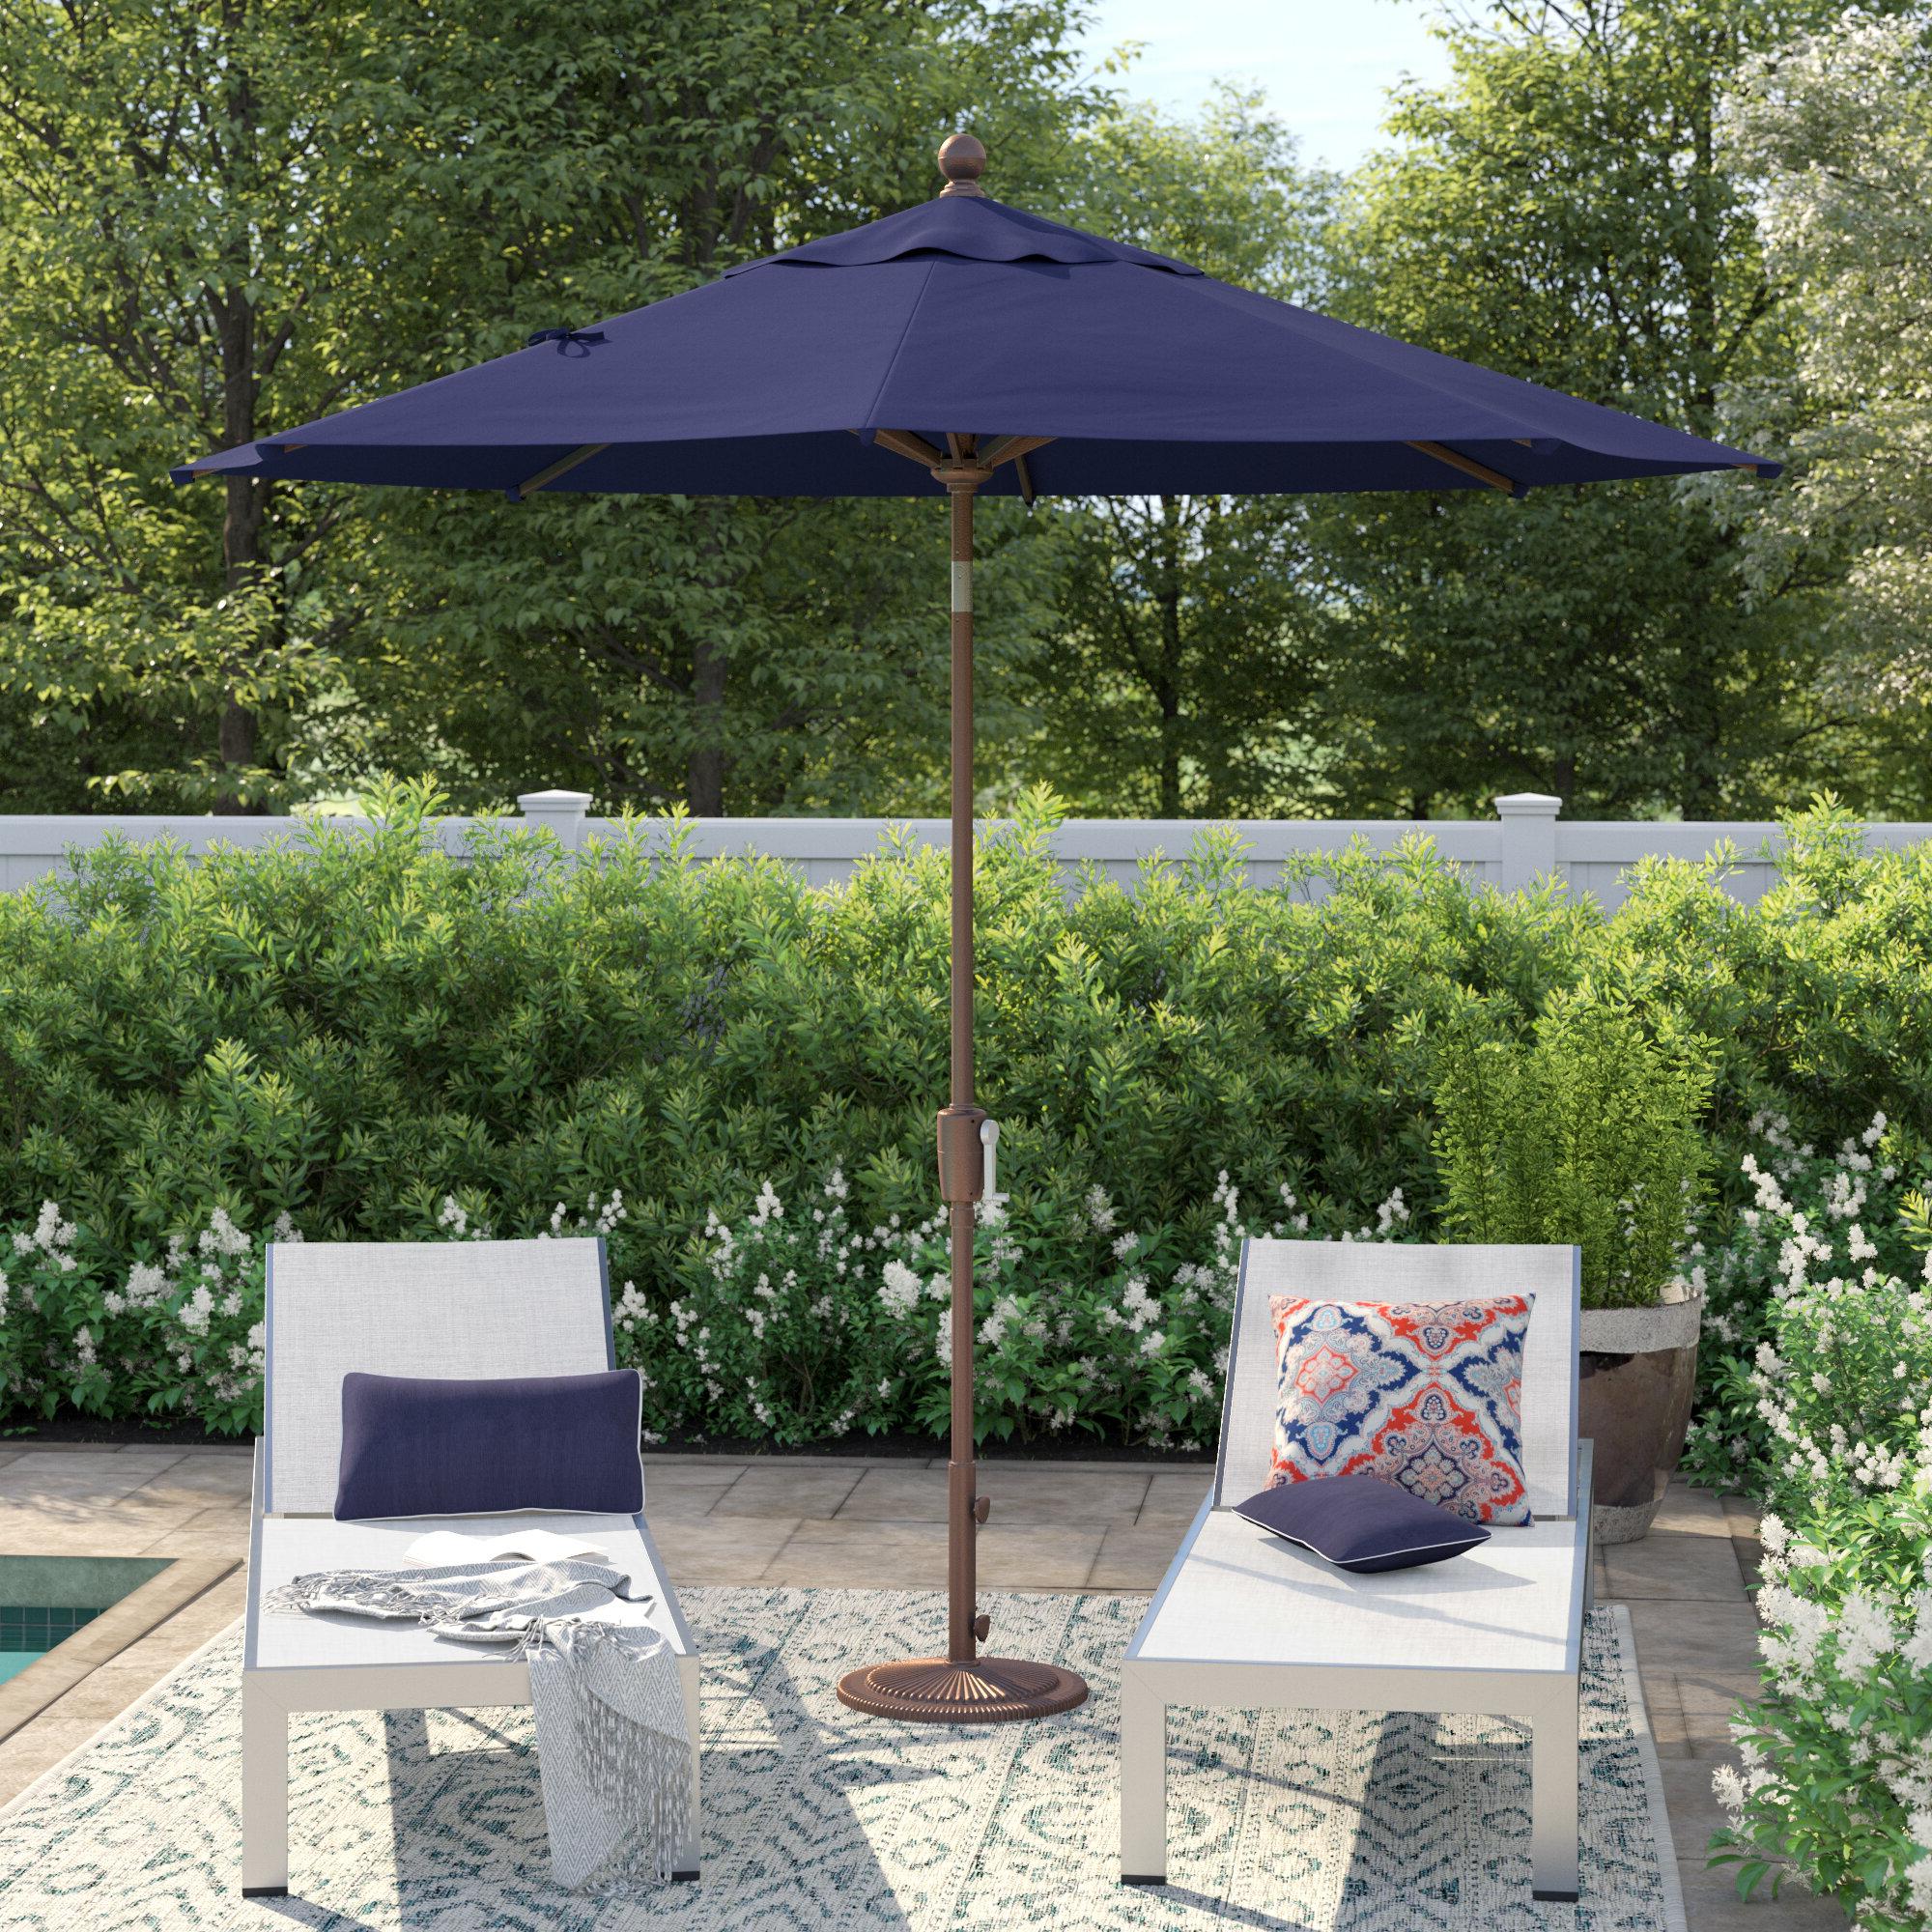 Launceston 9' Market Umbrella Within Most Recently Released Leachville Market Umbrellas (View 6 of 20)